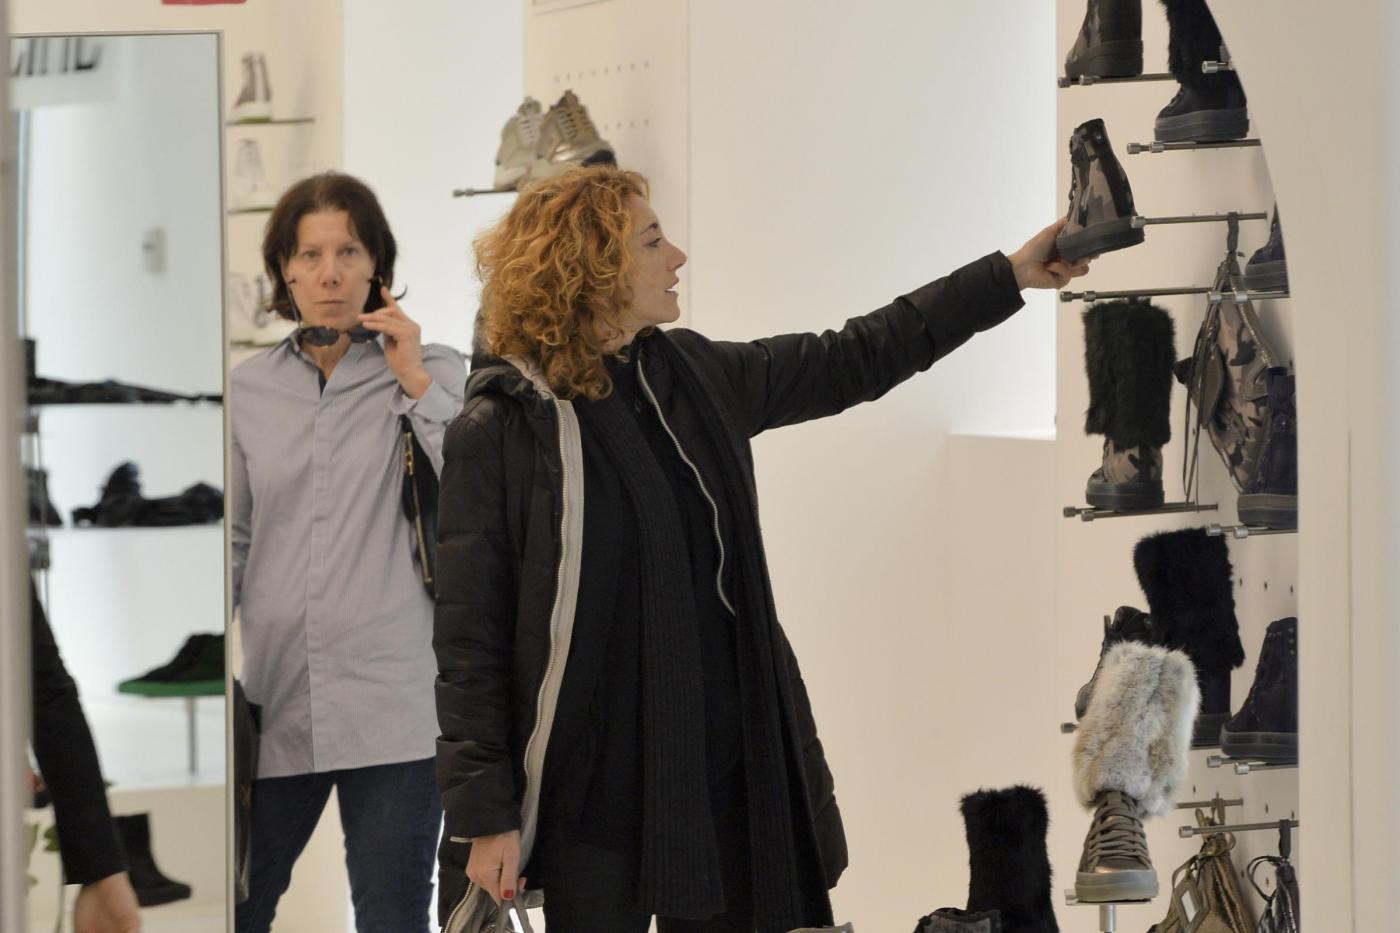 Eva Grimaldi e Roberta Garzia shopping insieme06